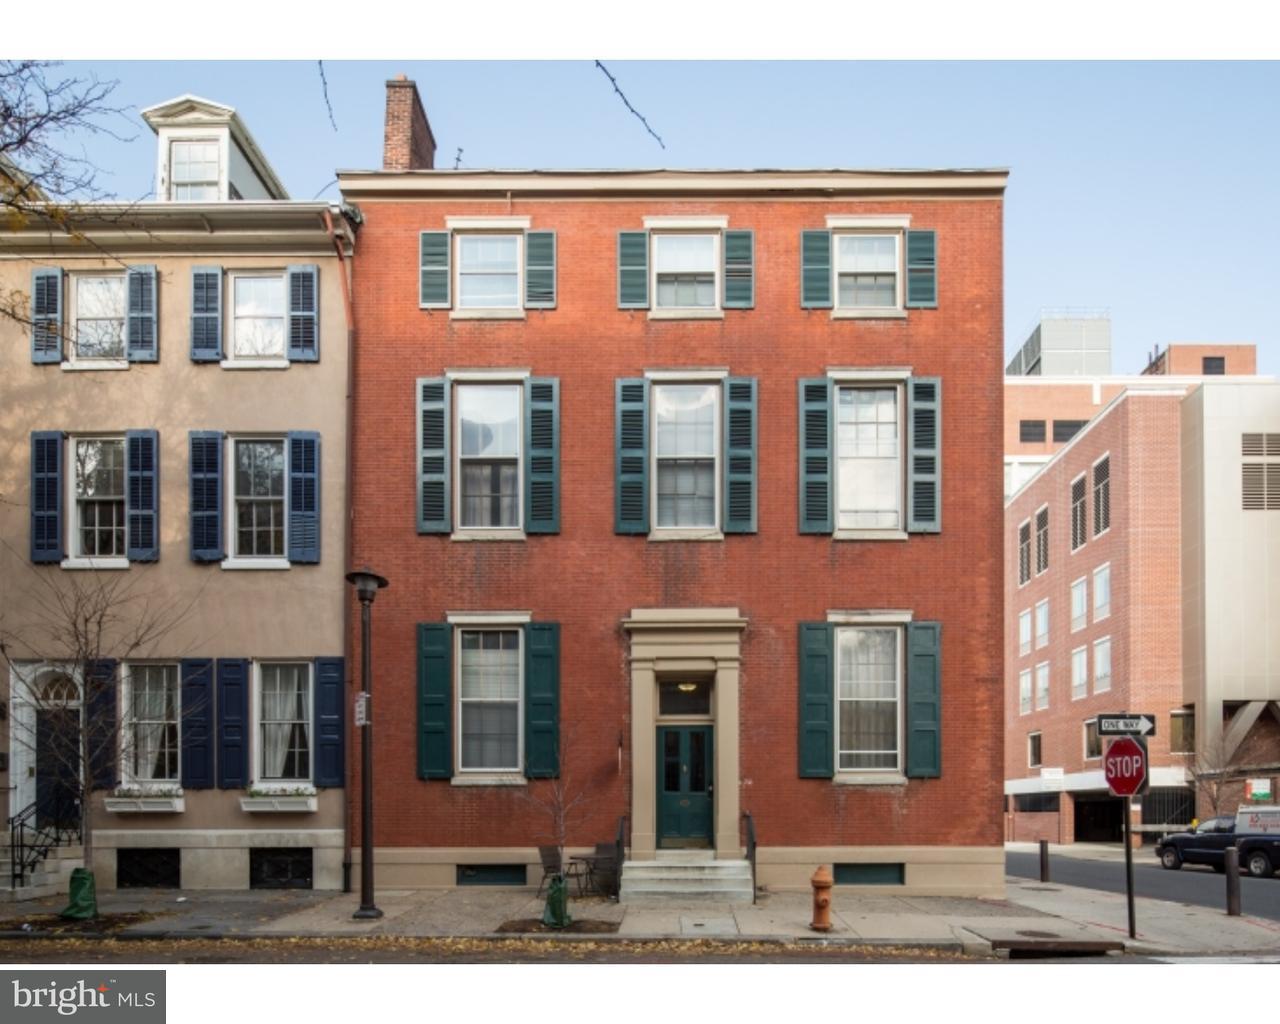 901 Clinton Street #6 Philadelphia, PA 19107